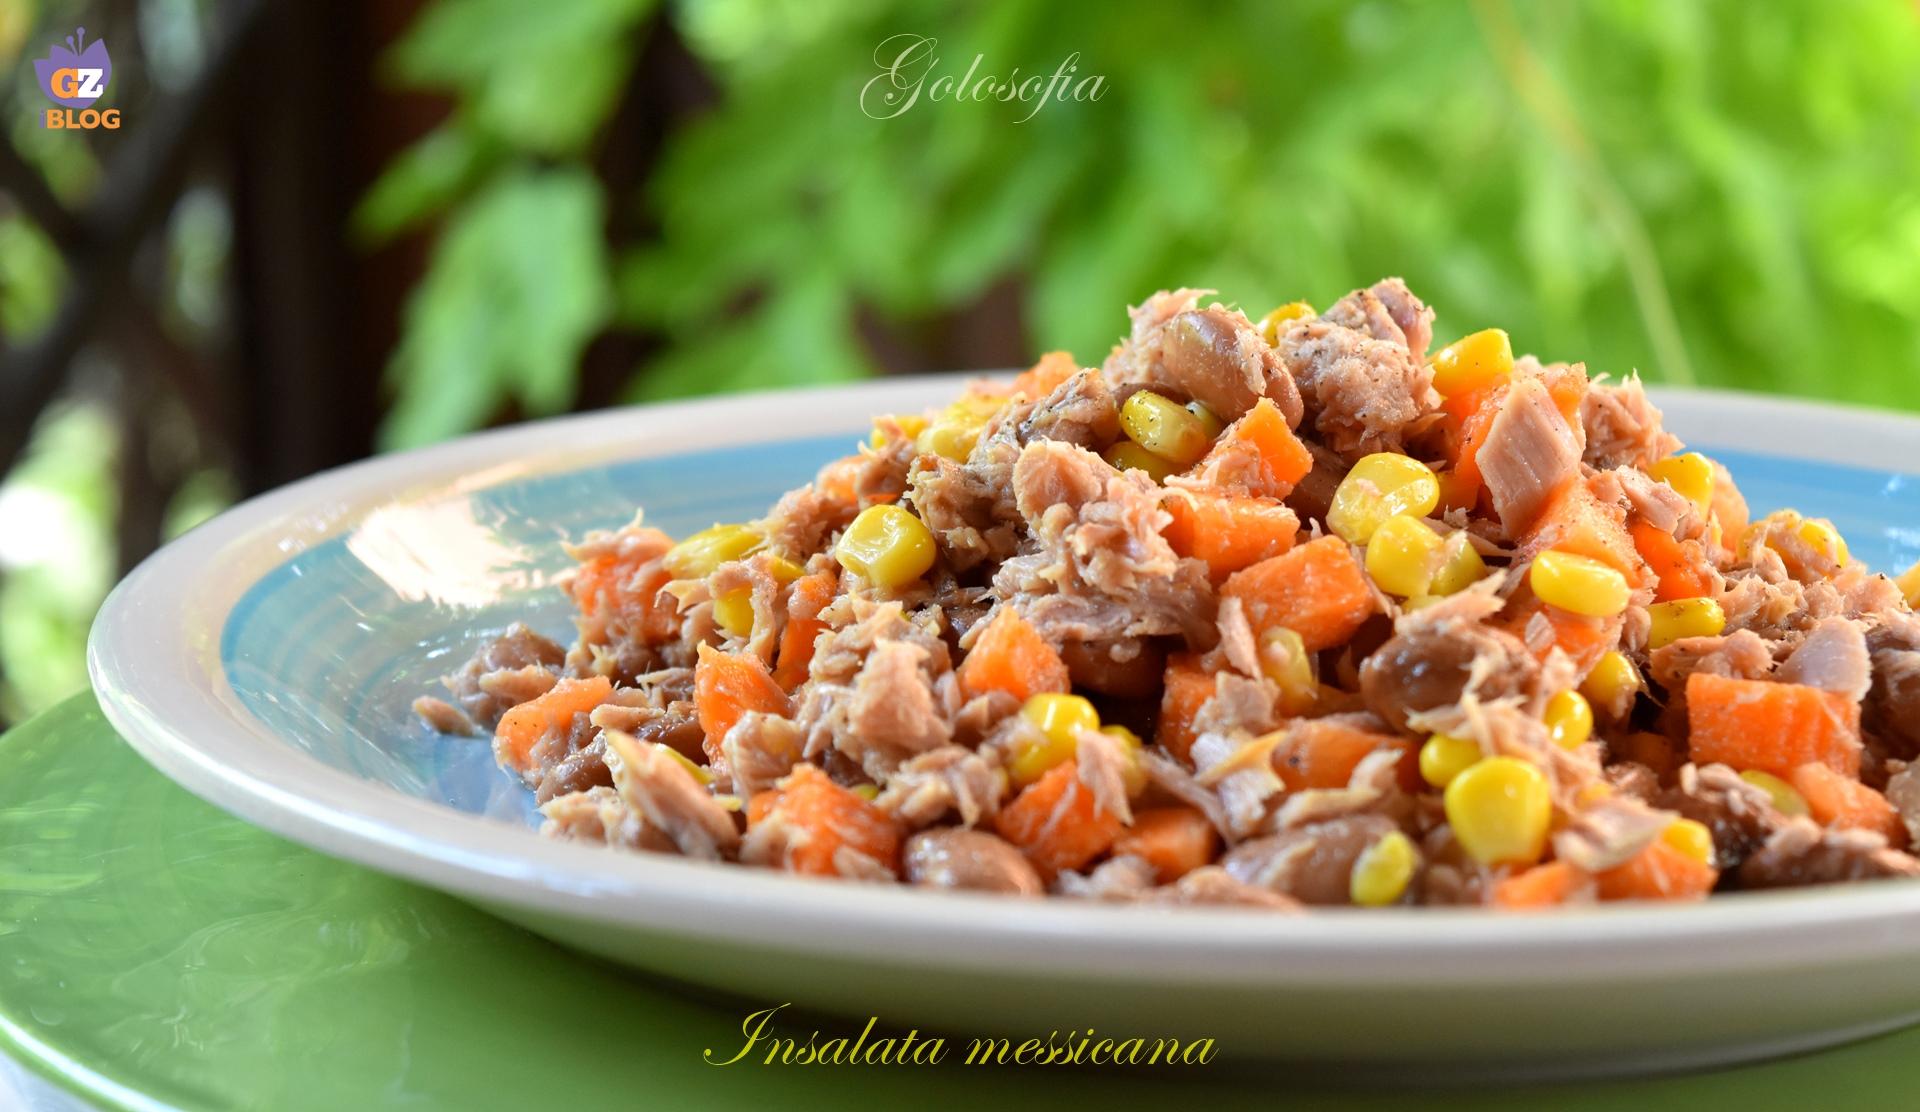 Insalata messicana-ricetta estiva-golosofia